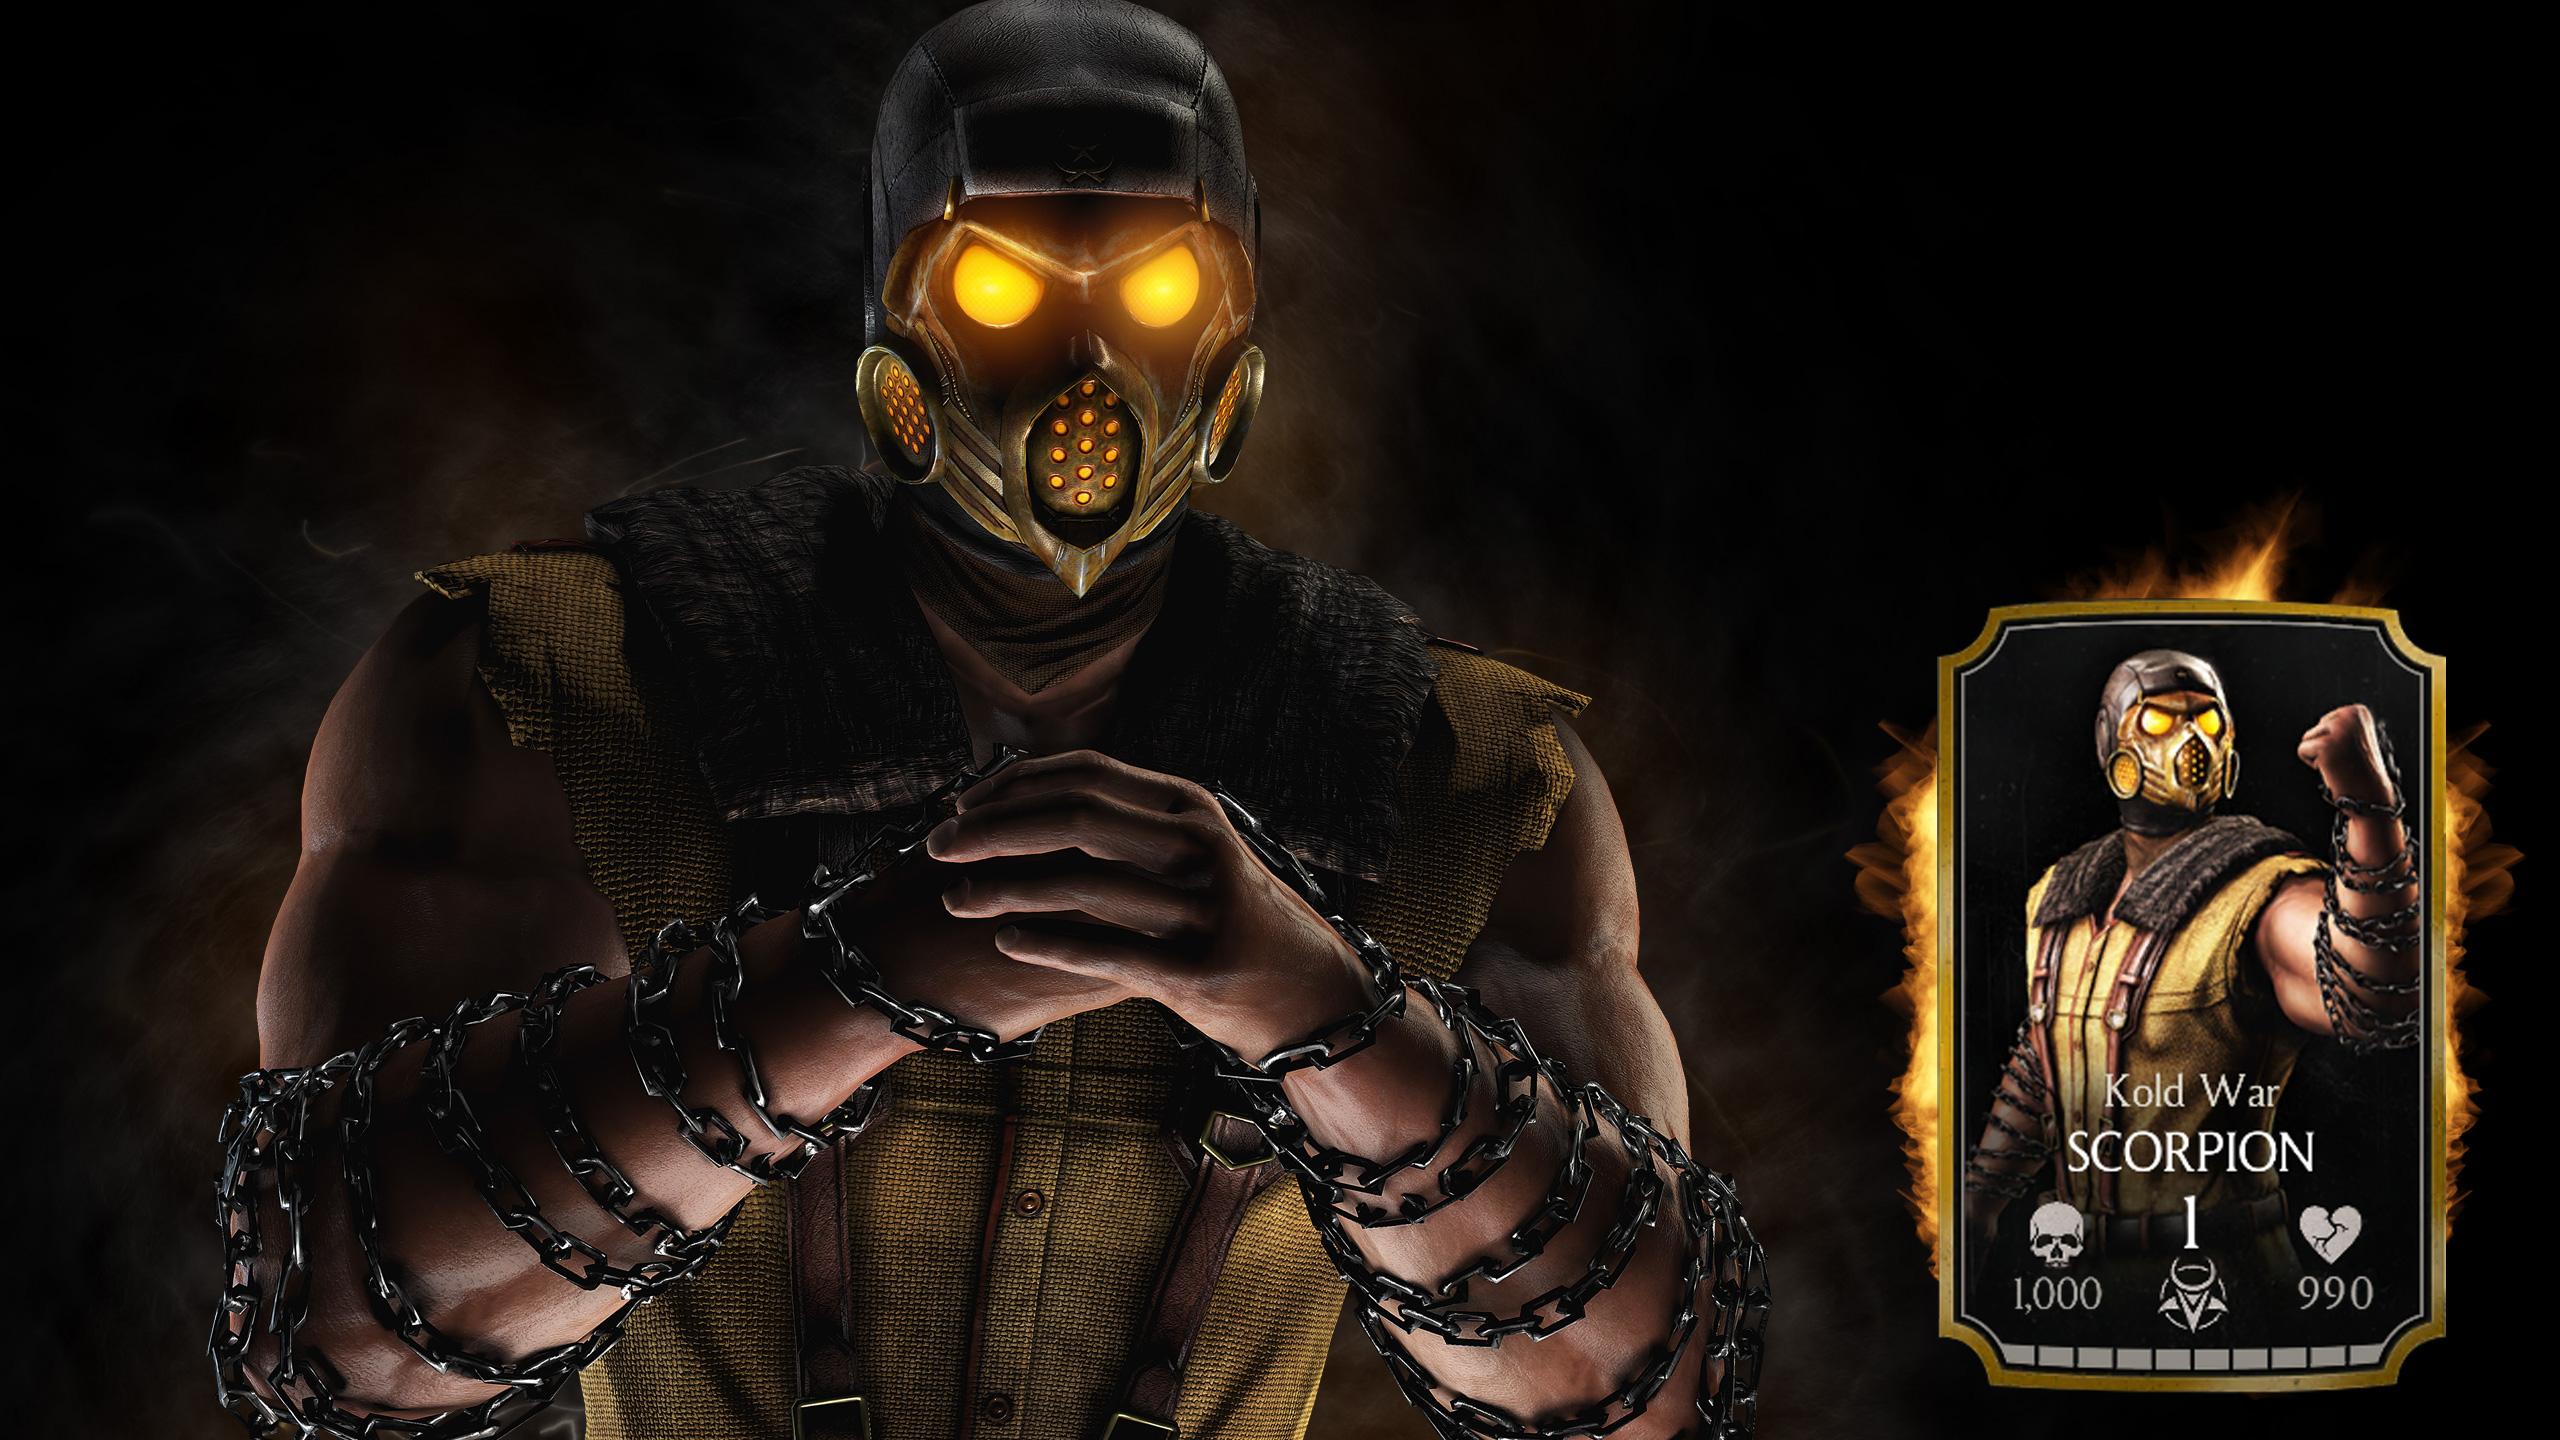 Scorpion Mortal Kombat X Game Wallpapers HD Wallpapers 2560x1440